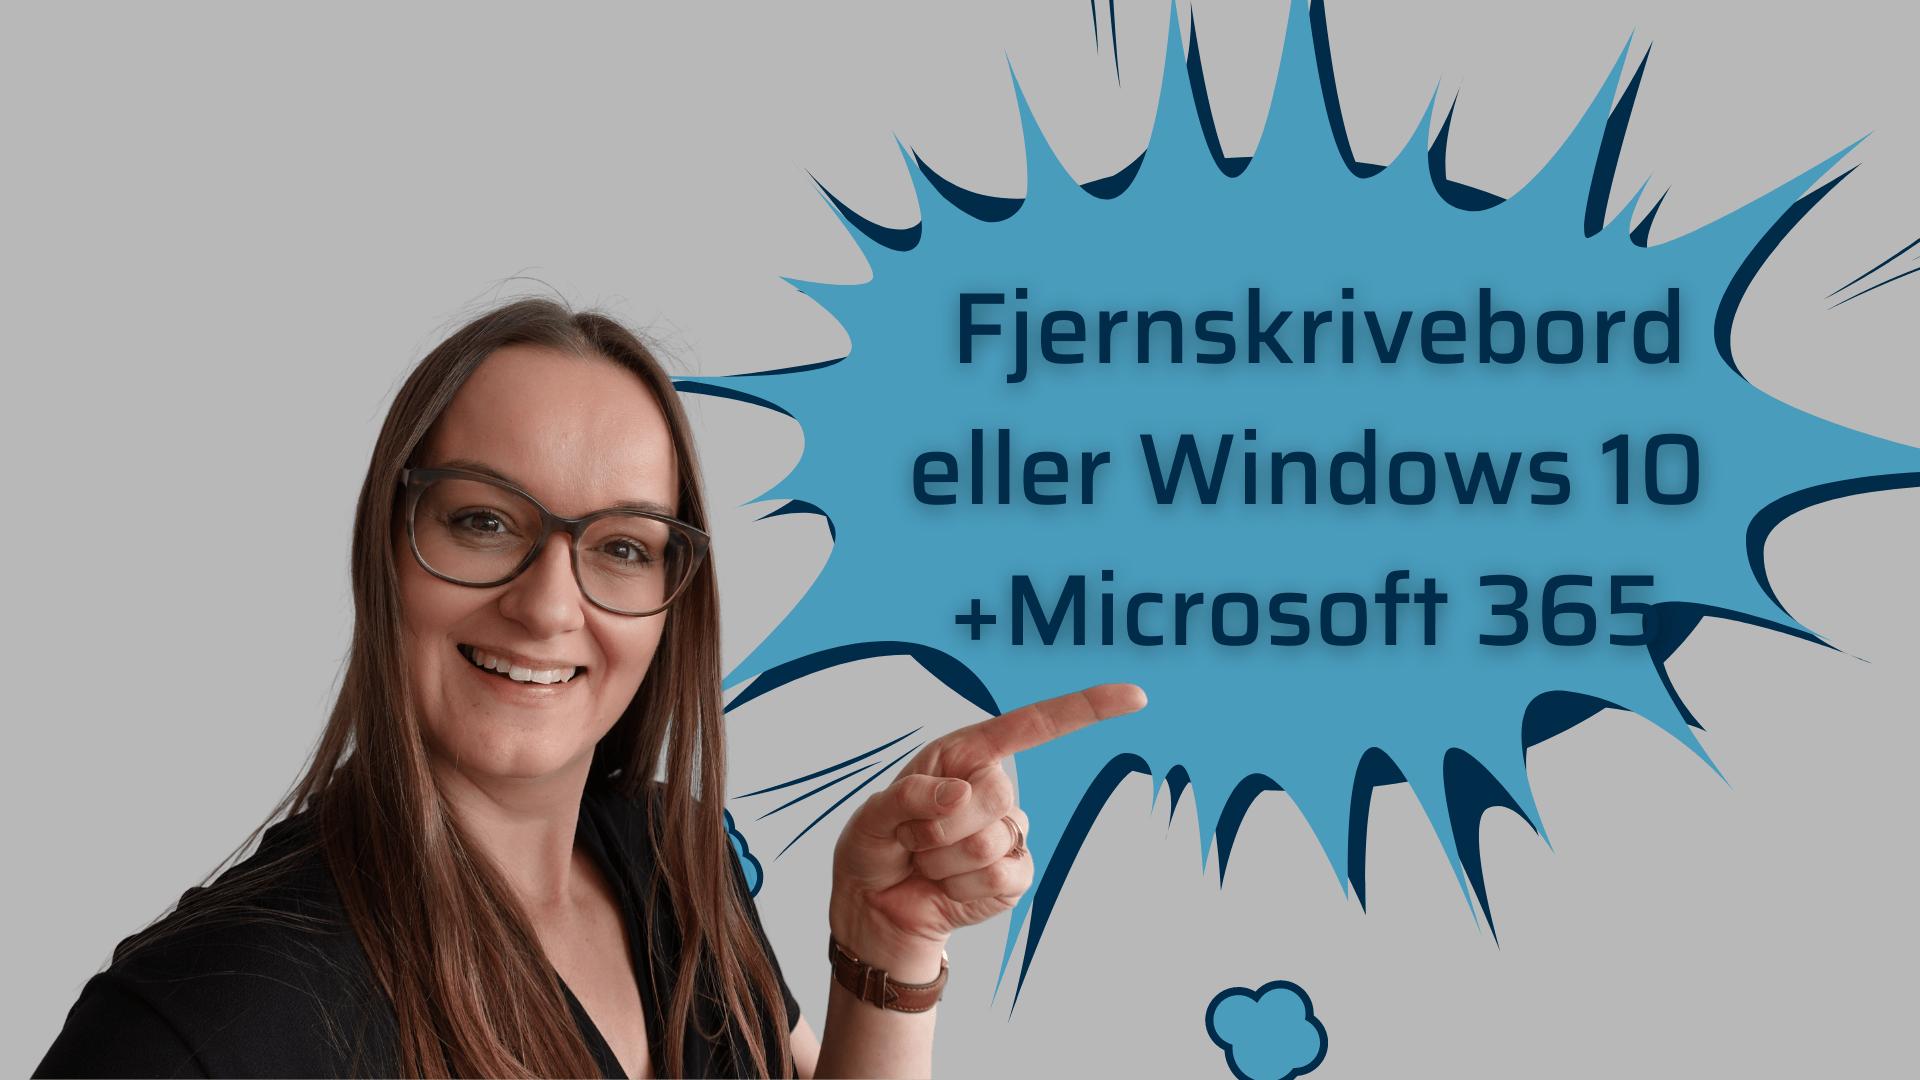 Fjernskrivebord eller windows 10 + microsoft 365